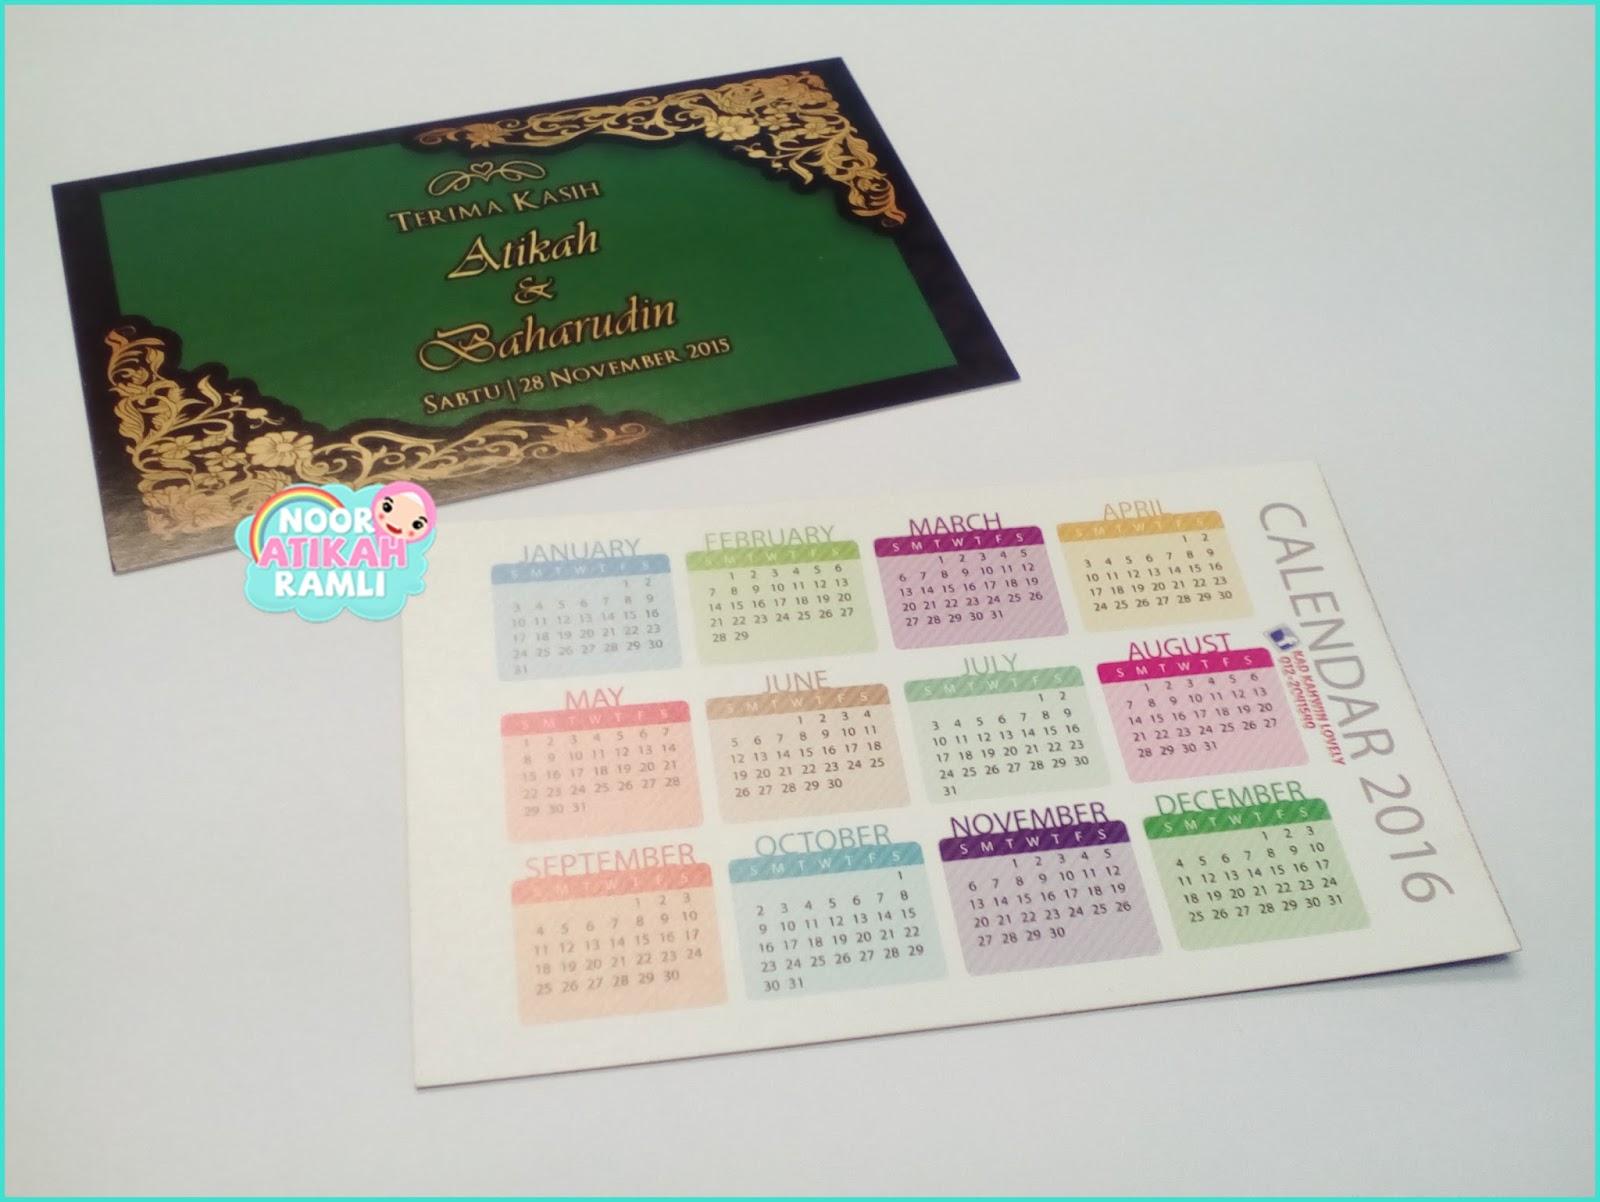 Calendar Pocket Kahwin Lootcoza Sitemap Kad Kahwin By Kad Kahwin Lovely Aandb Big Day Noor